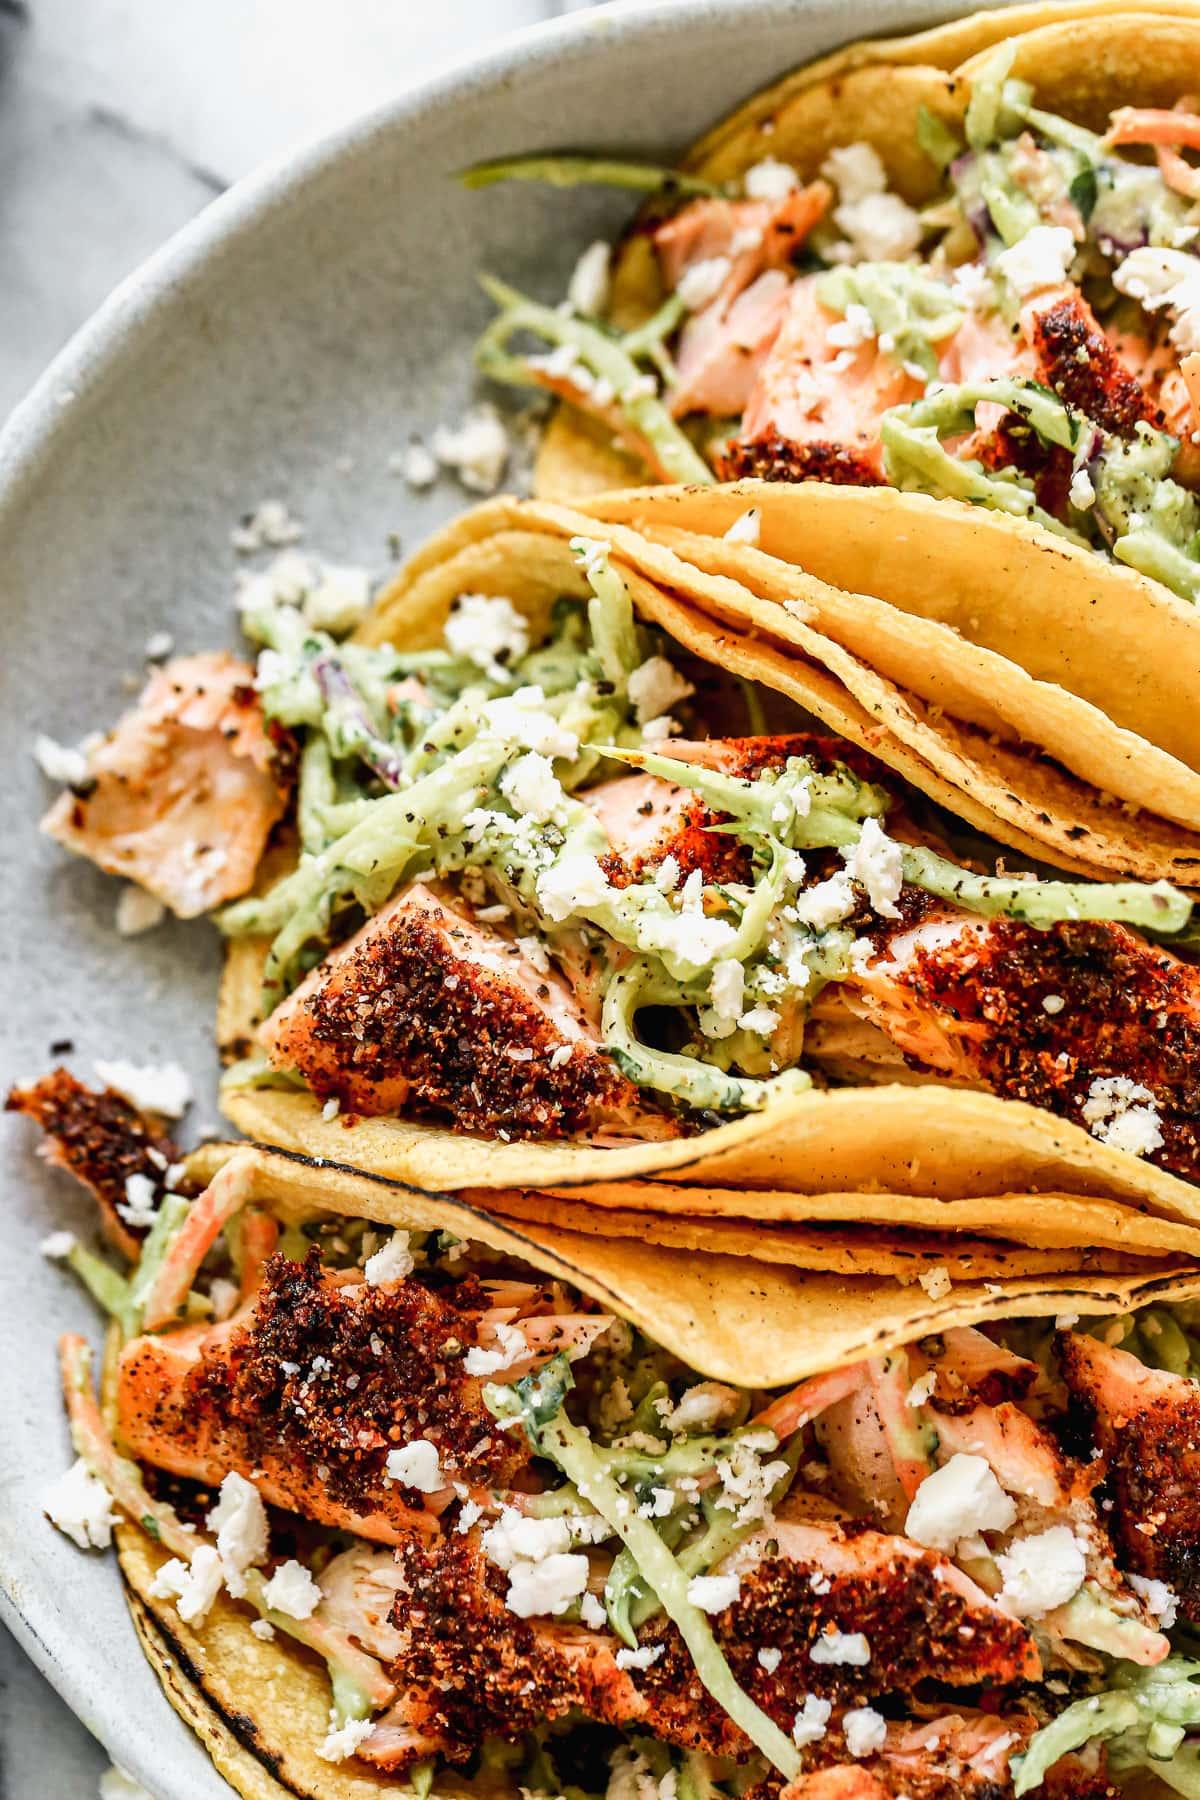 Easy salmon tacos with avocado slaw